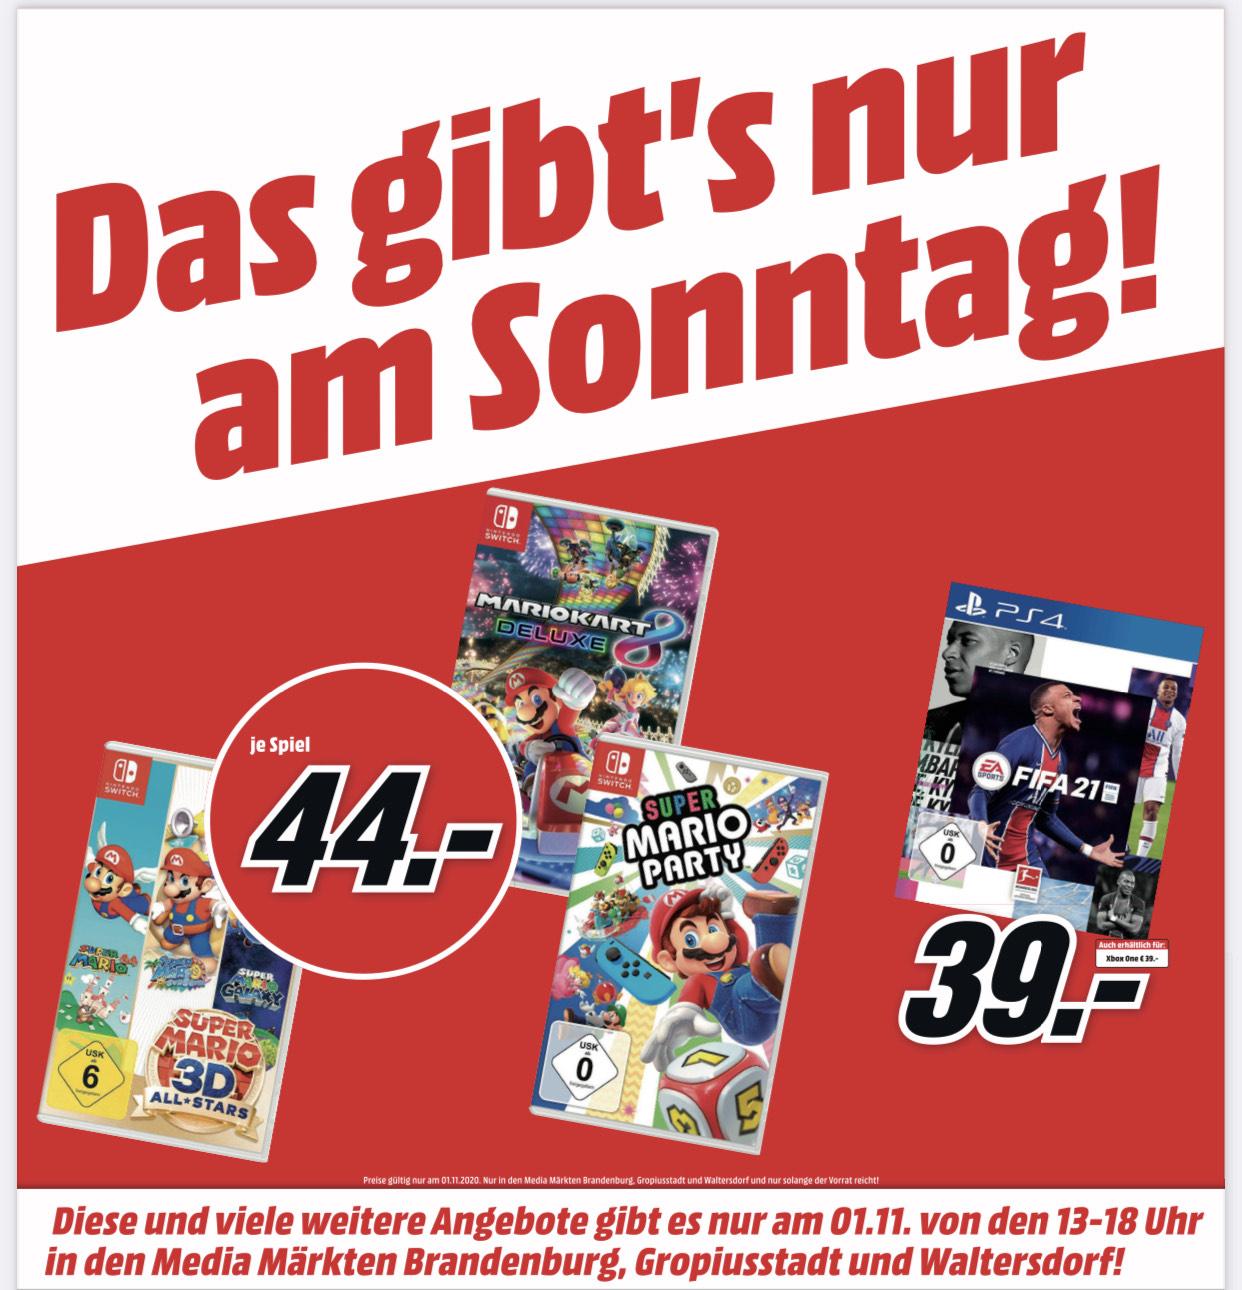 [Lokal Mediamarkt] Fifa 21 PS4, Xbox 39 Euro, Super MarioKart 8 Deluxe, Super Mario Party, Super Mario 3D Allstars 44 Euro Nintendo Switch